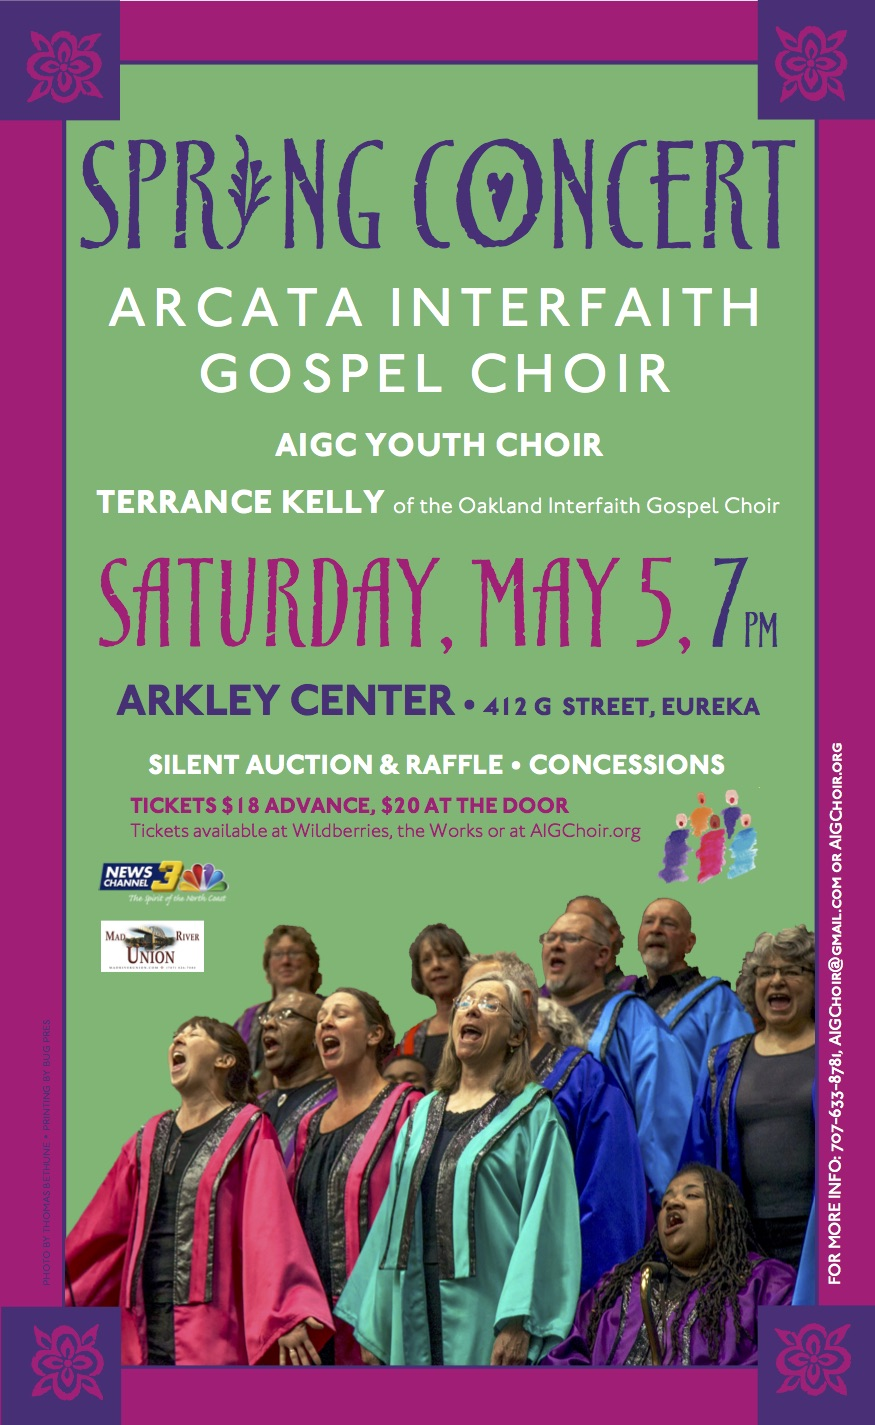 AIGC Spring Concert 2018 poster-screen version.jpeg